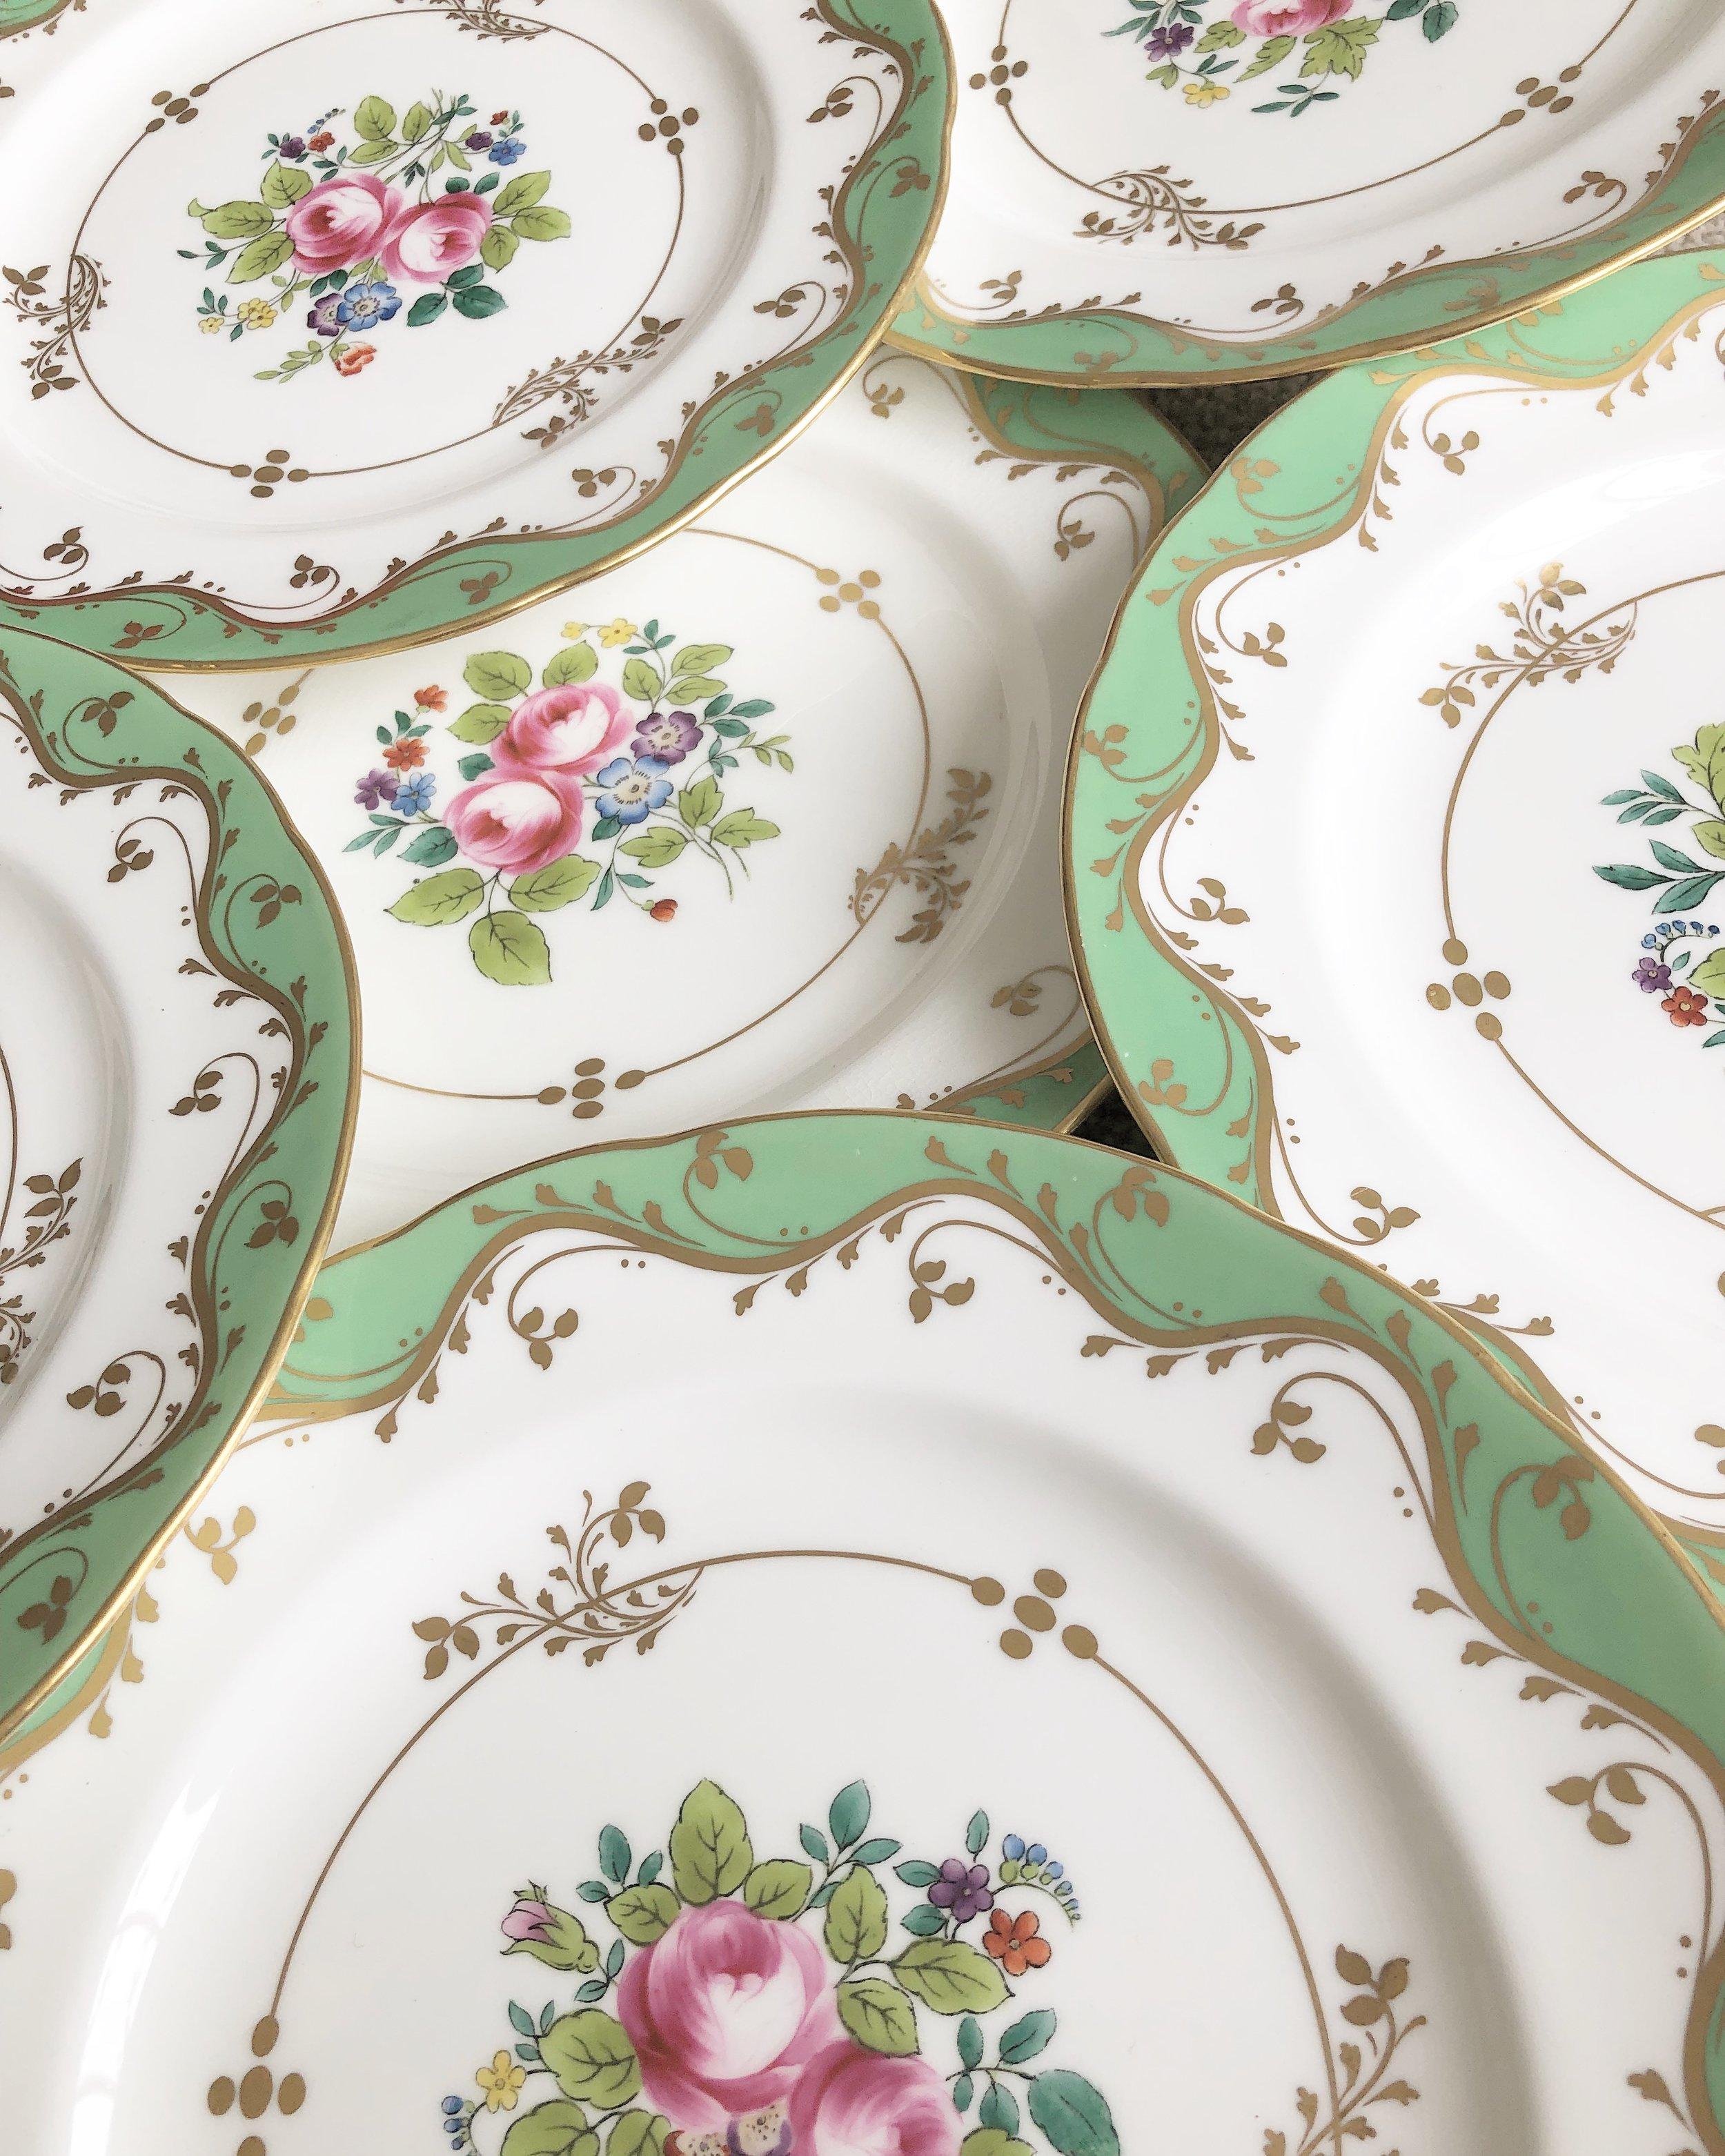 A set of six hand-painted antique Minton plates